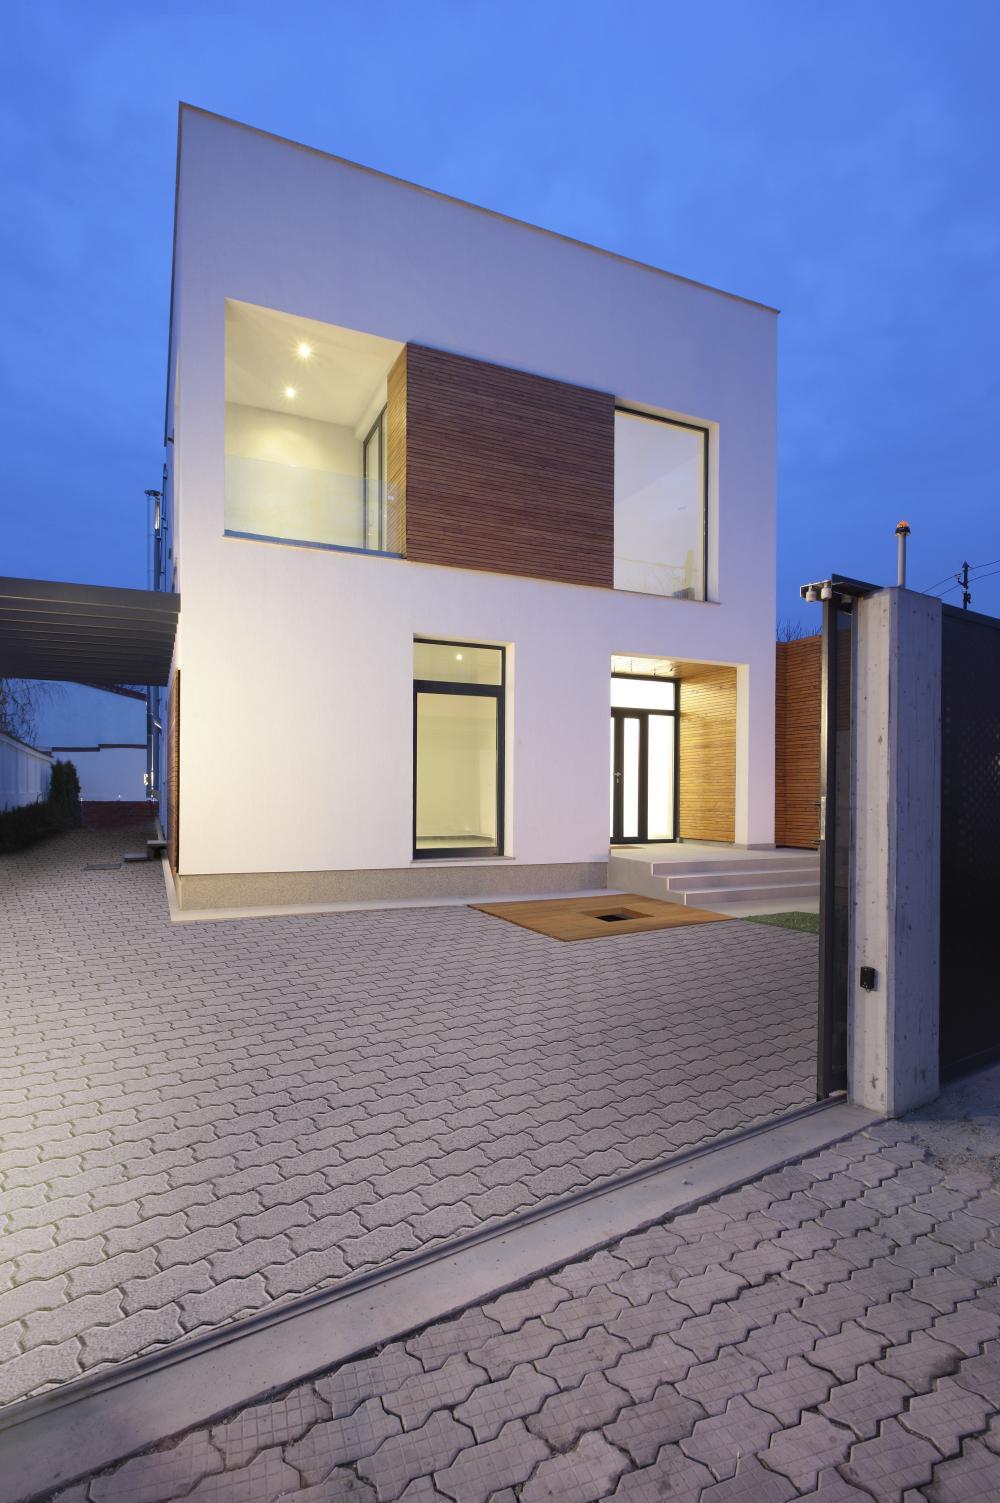 https://nbc-arhitect.ro/wp-content/uploads/2020/11/NBC-ARHITECT-_-residential-_-Mibe-House-_-exterior-view_4.jpg